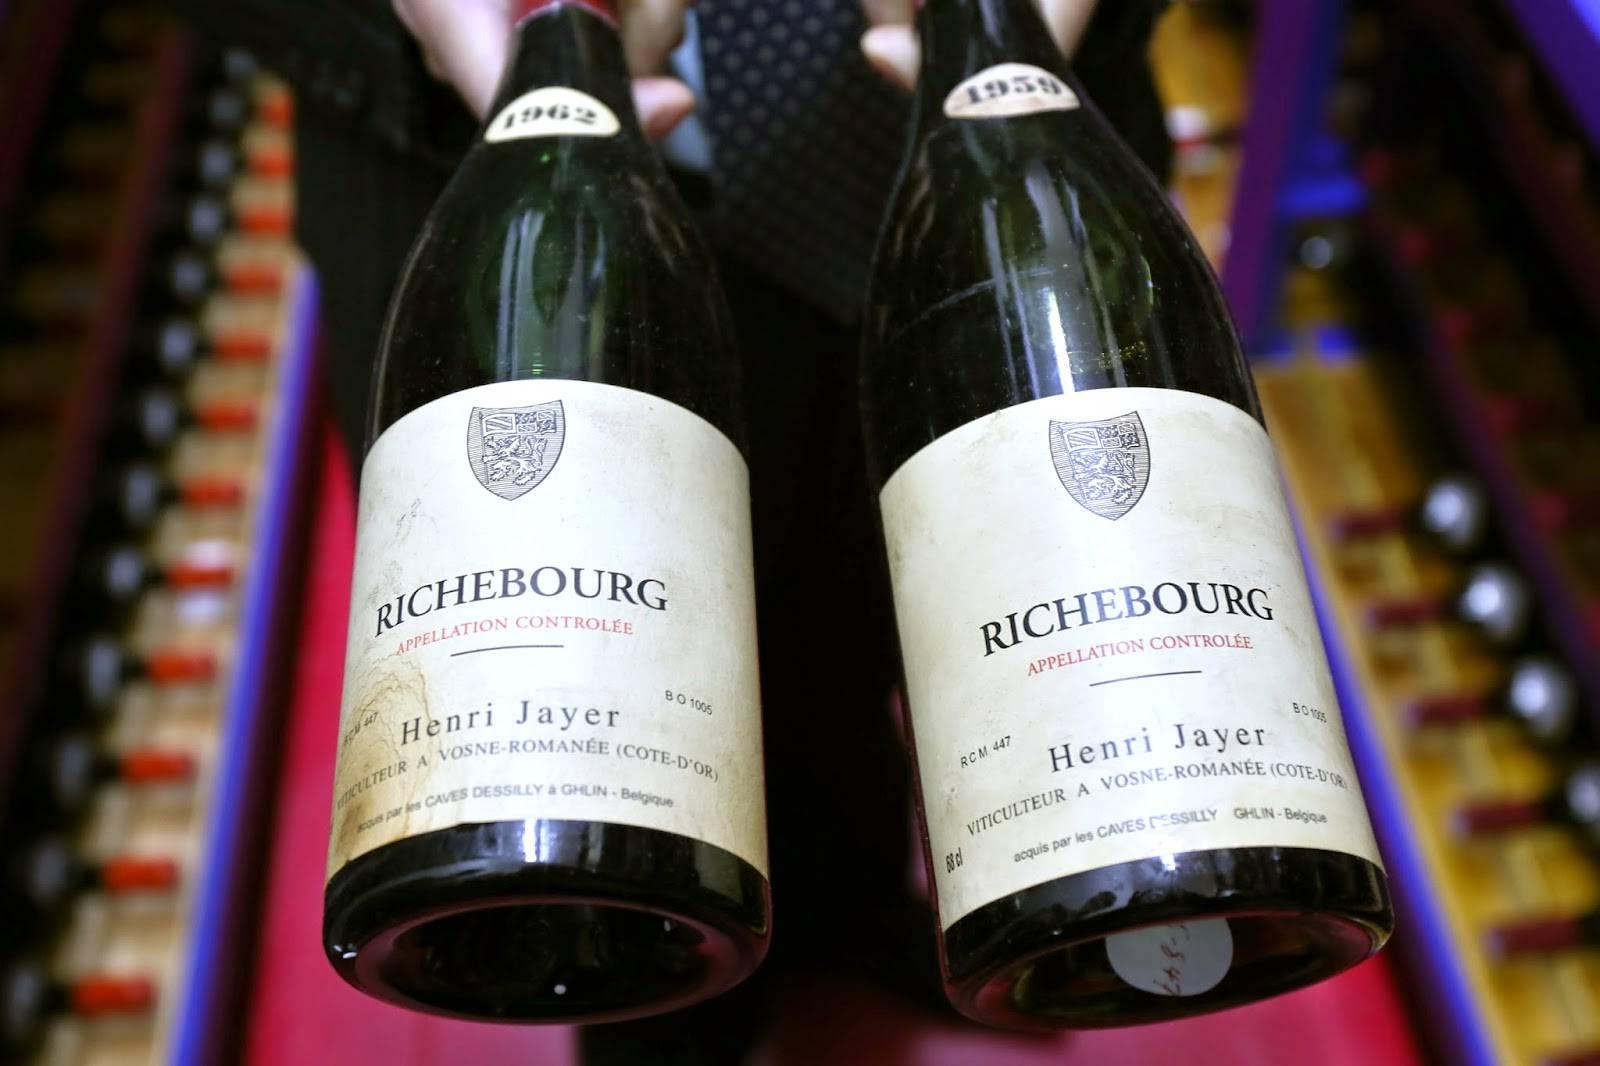 I have a Jayer Richebourg wine Henri